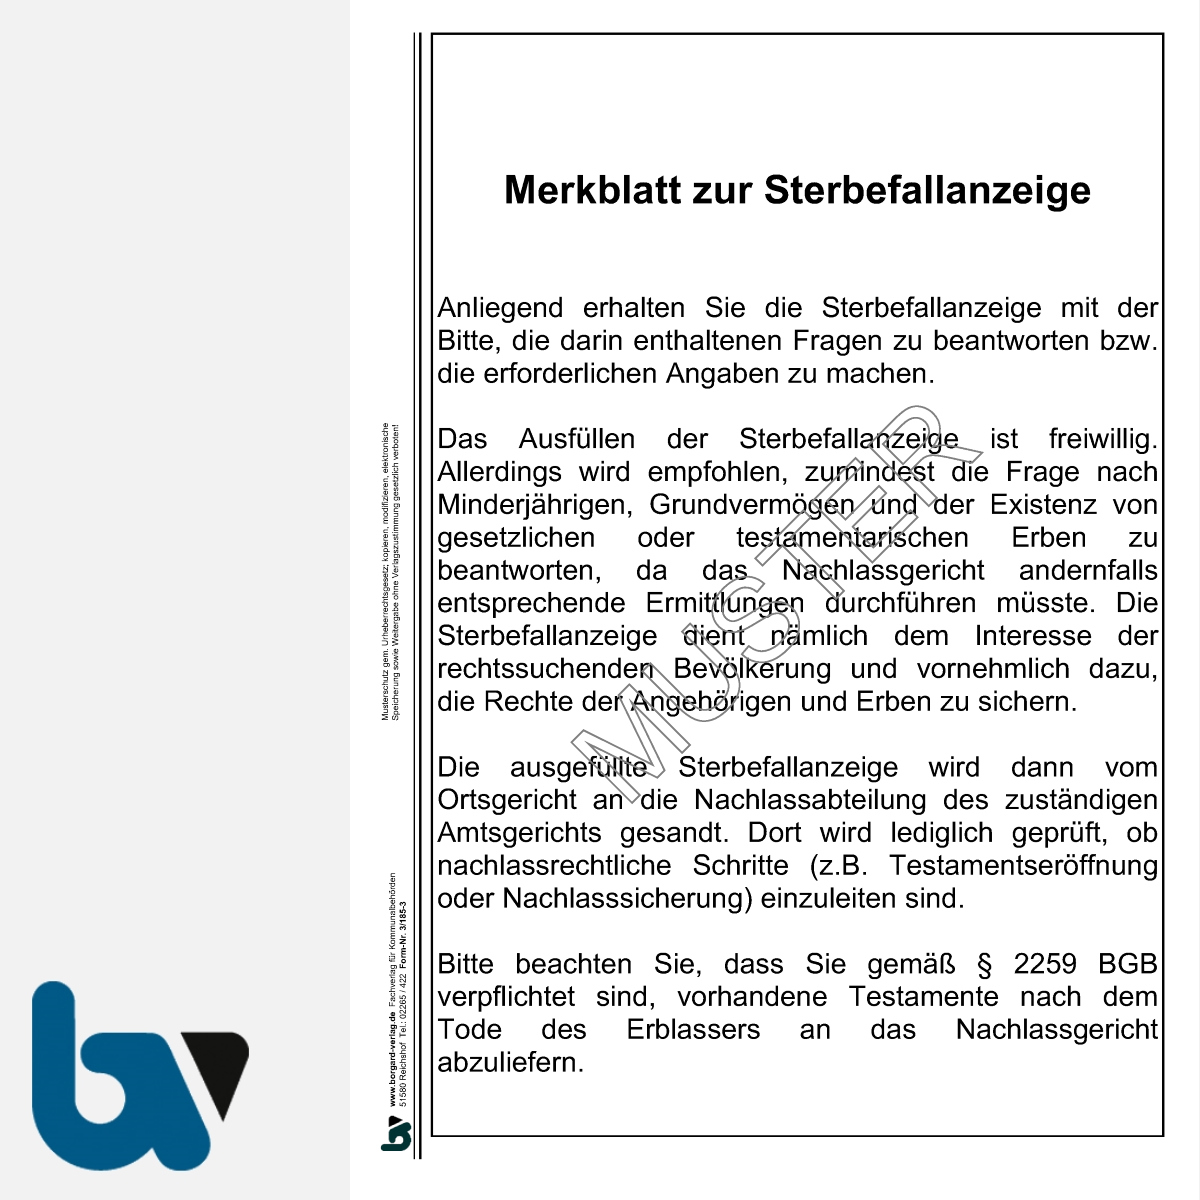 3/185-3 Merkblatt Sterbefallanzeige Ortsgericht Hessen DIN A4 | Borgard Verlag GmbH